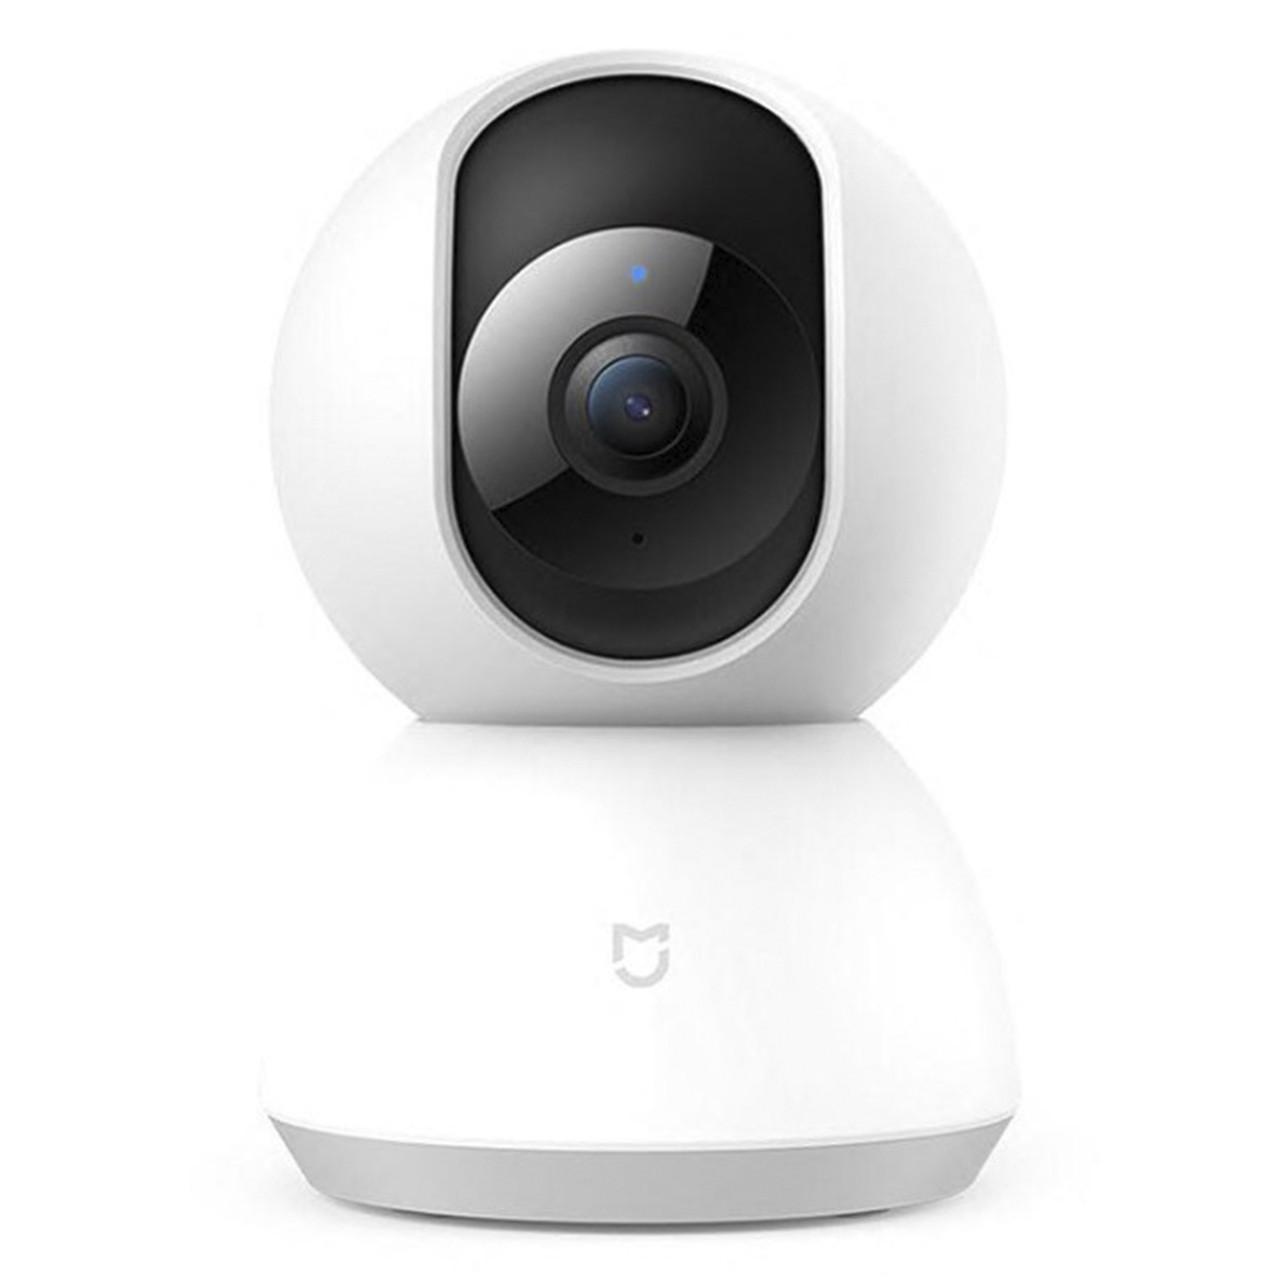 IP-камера видеонаблюдения Xiaomi MiJia 360 Home Security 1080 p Белый (3619-10299)